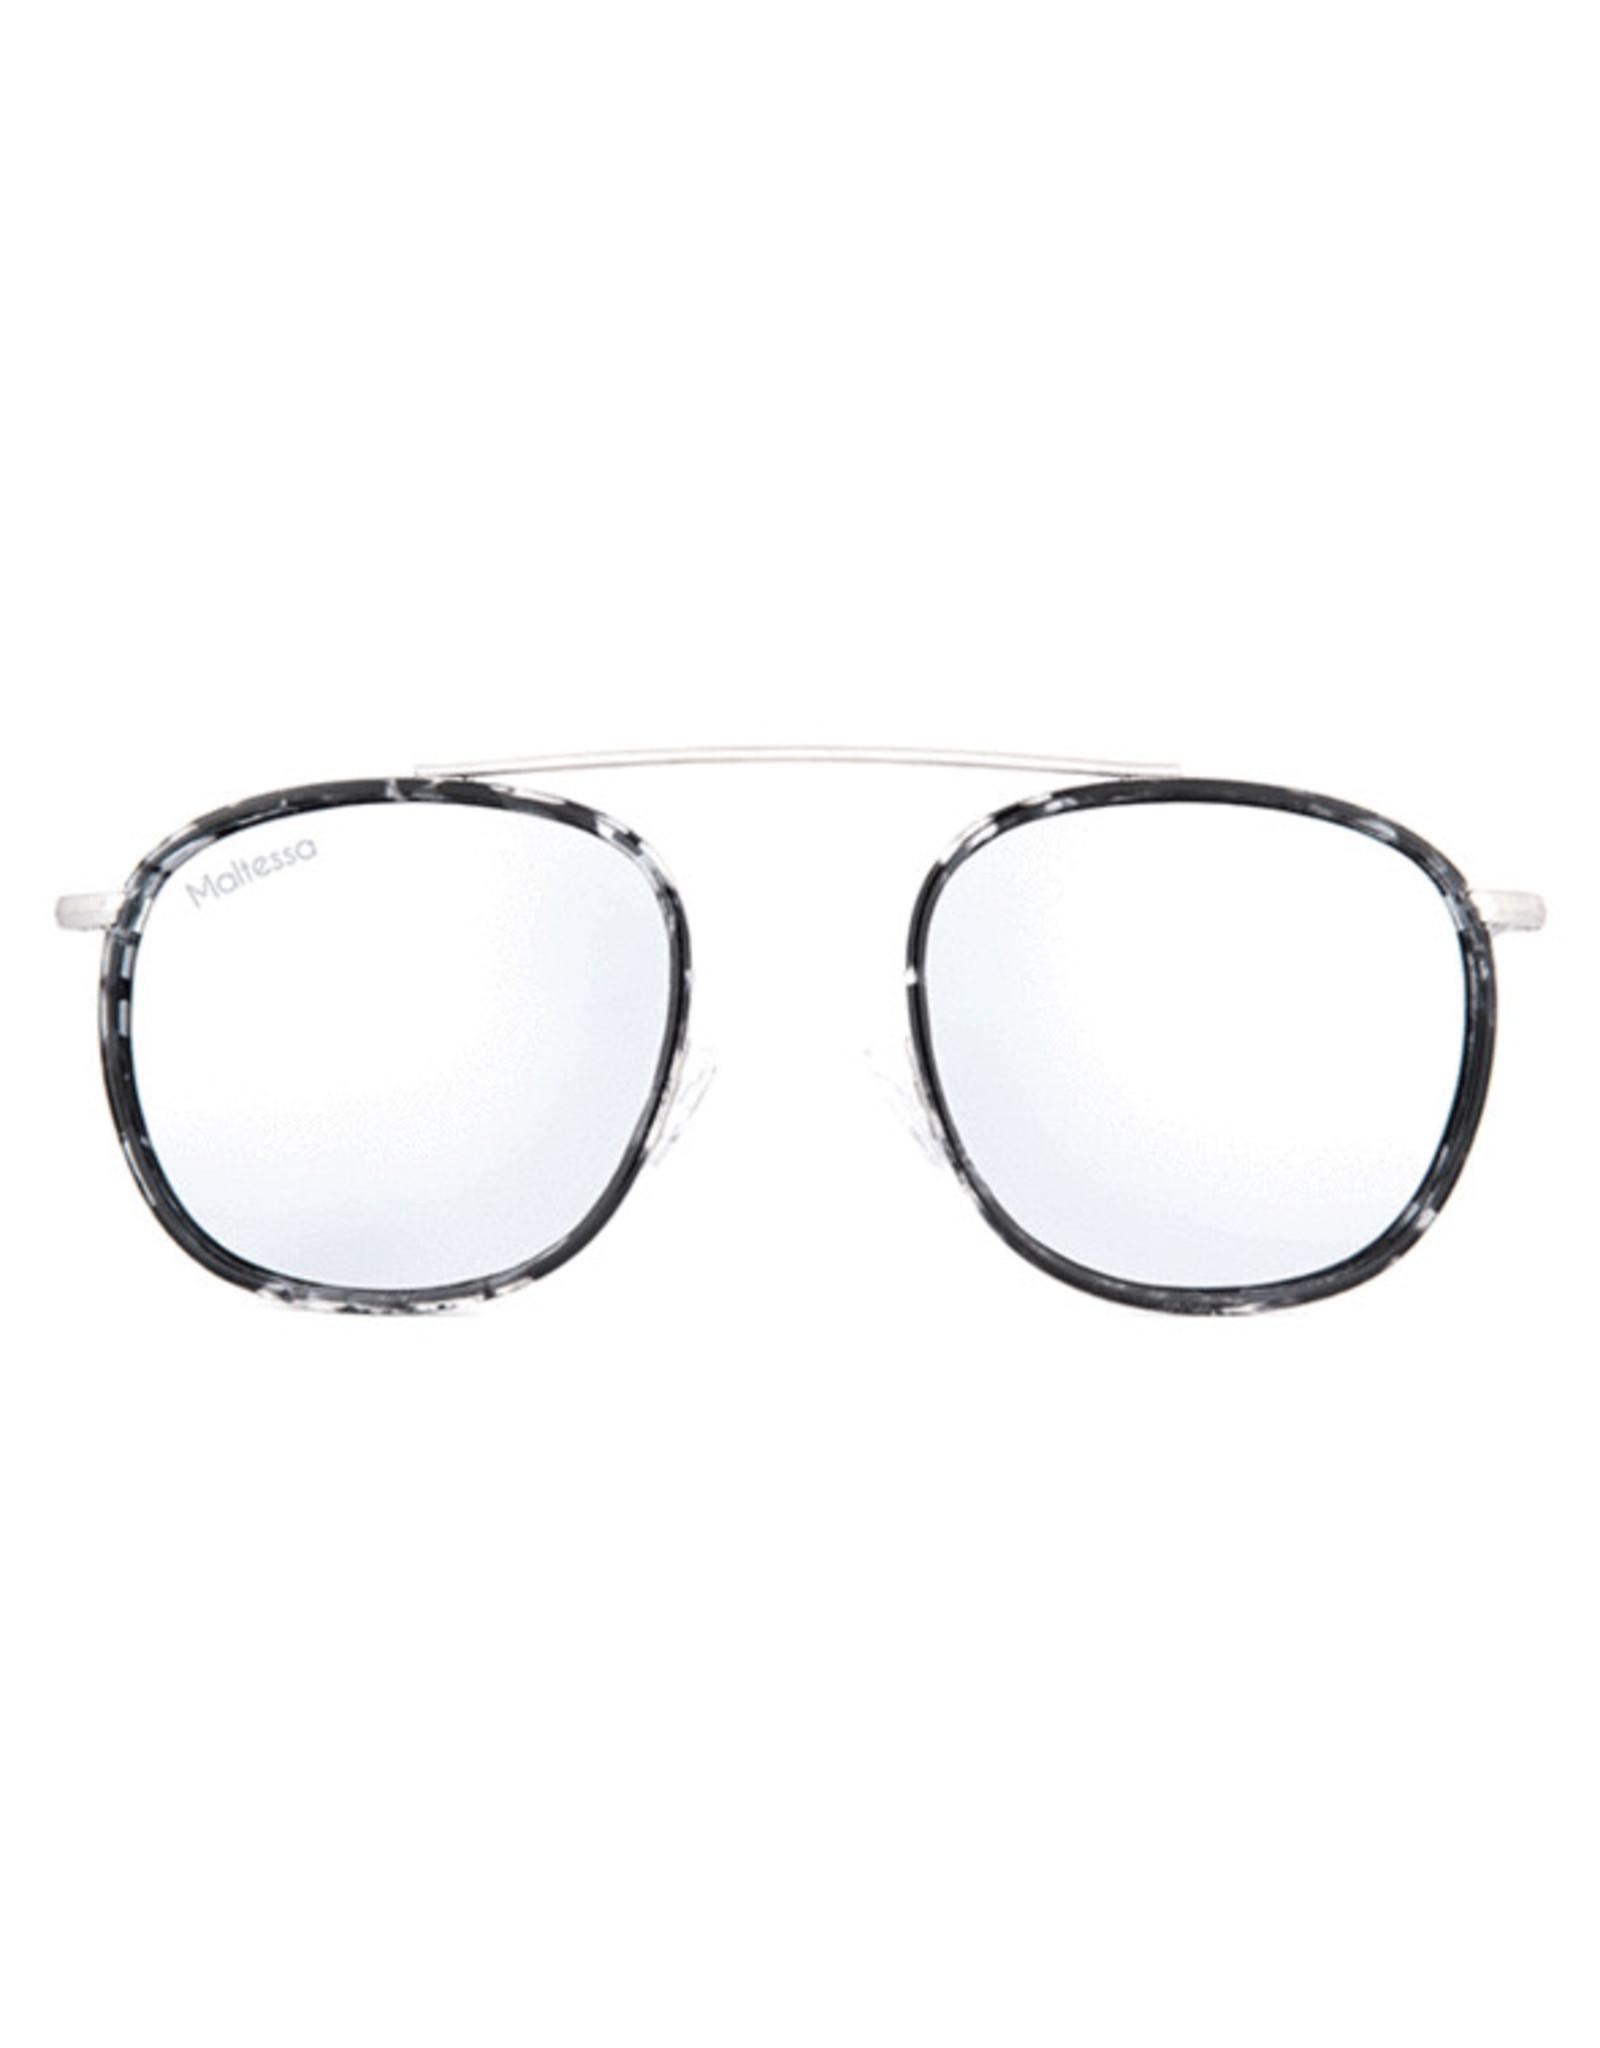 Maltessa Eyewear Milano